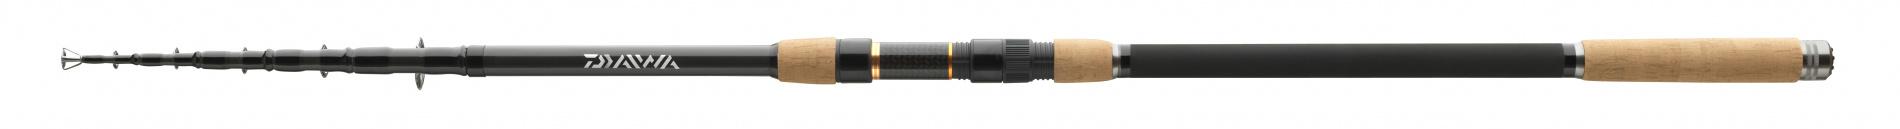 Удилище карп. DAIWA Black Widow Carp BWС 3300T-AD 3,90м Удилища карповые<br>Телескопическое карповое удилище. Длина <br>- 3,9 м Тест - 3,5 LB Транспортная длина - 109 см <br>Вес - 312 г<br>